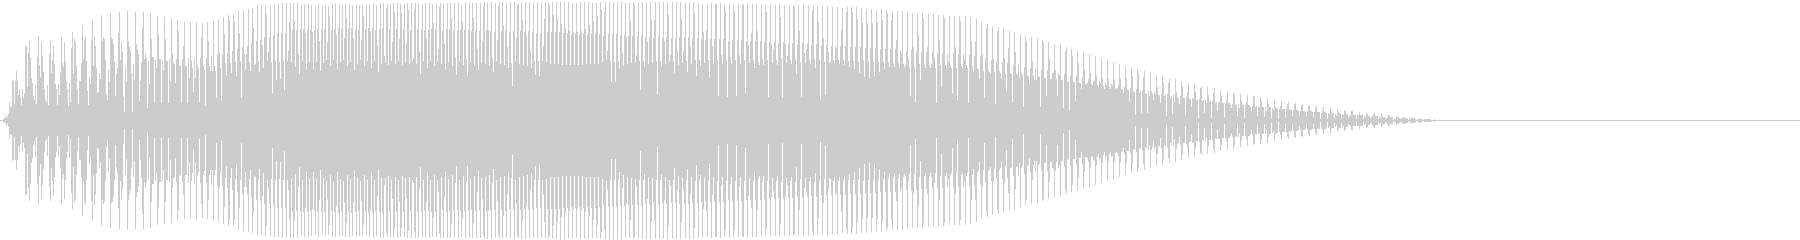 Game 横スクロール系ゲーム 効果音4の未再生の波形